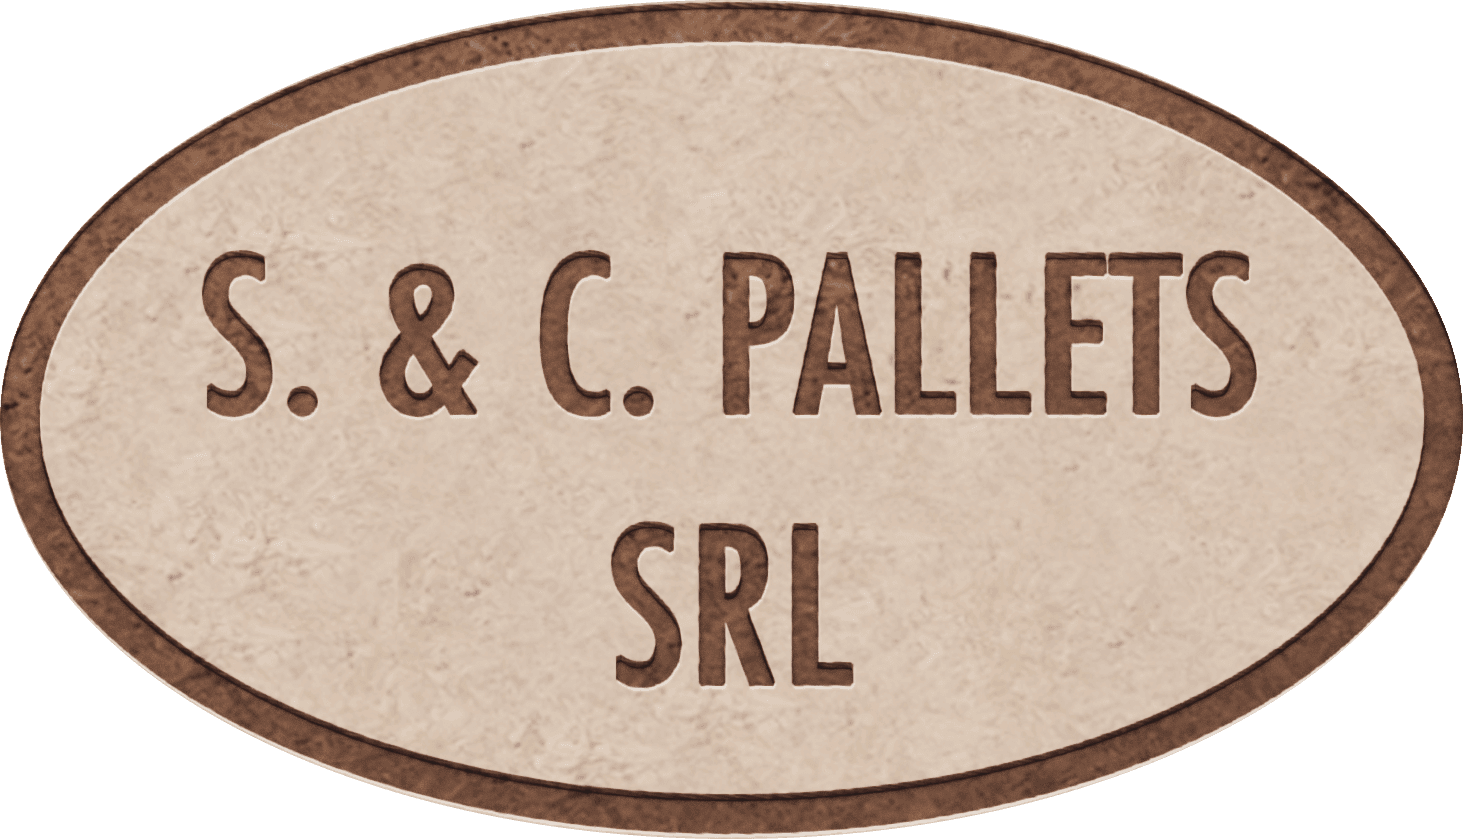 S. & C. PALLETS-Logo